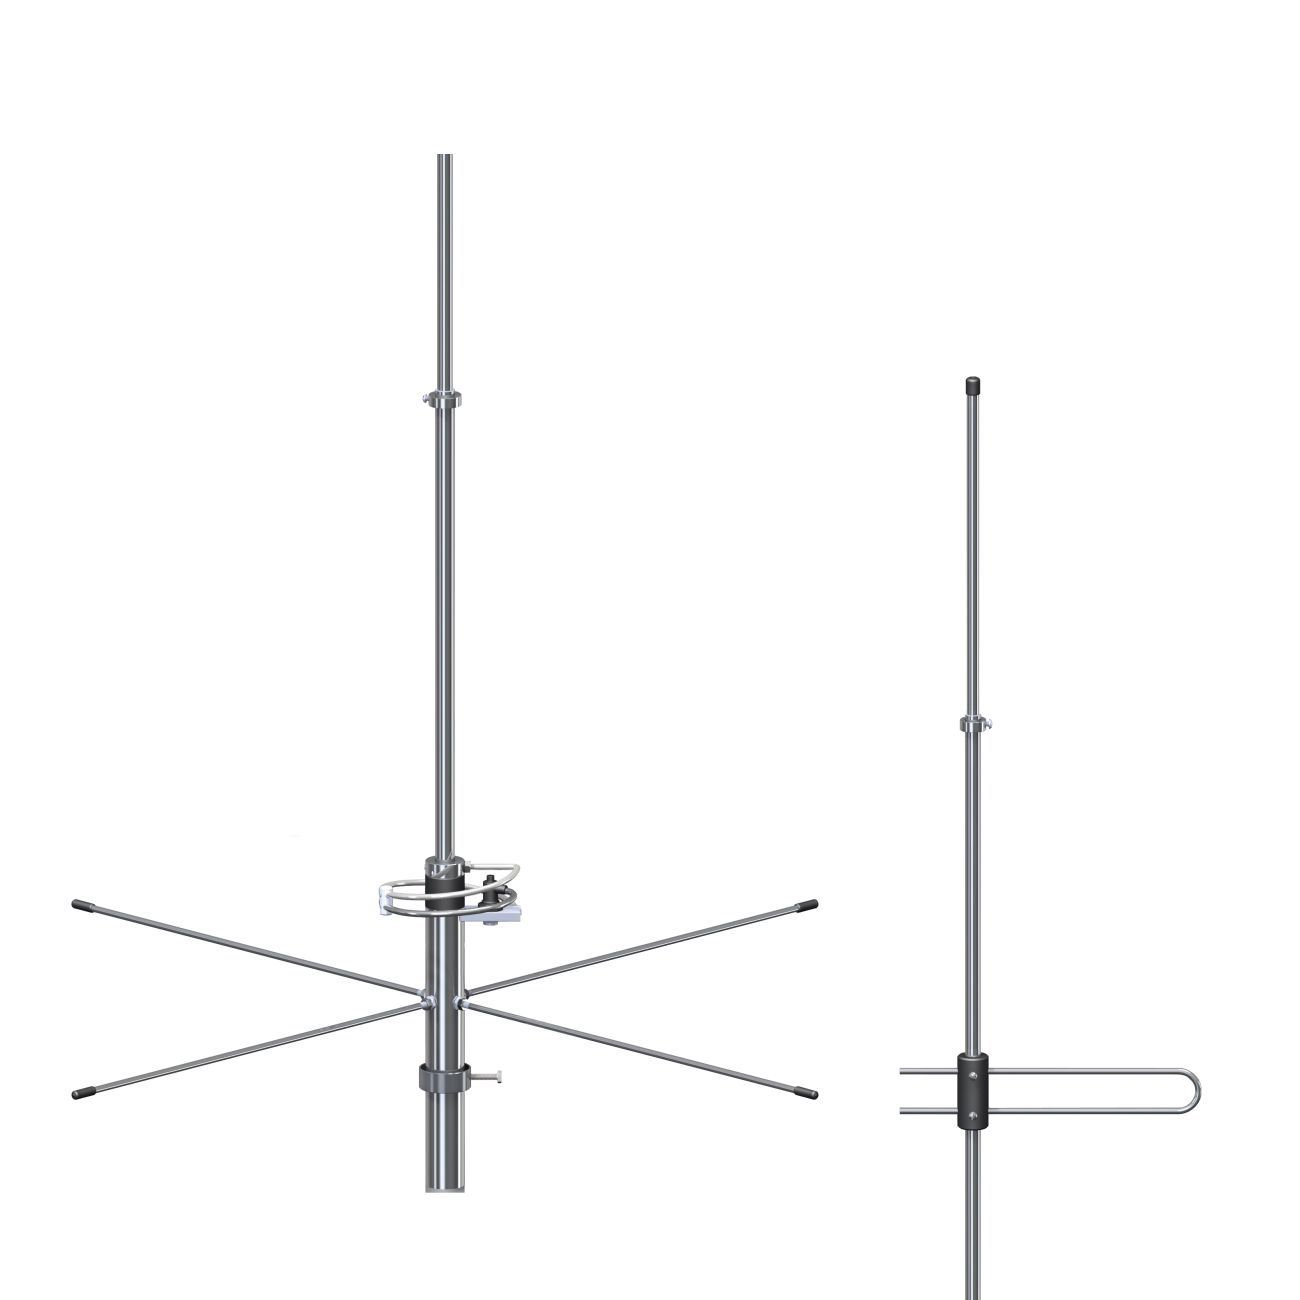 Antena Base VHF Plano Terra FM 2X 5/8 De Onda Steelbras - AP2449